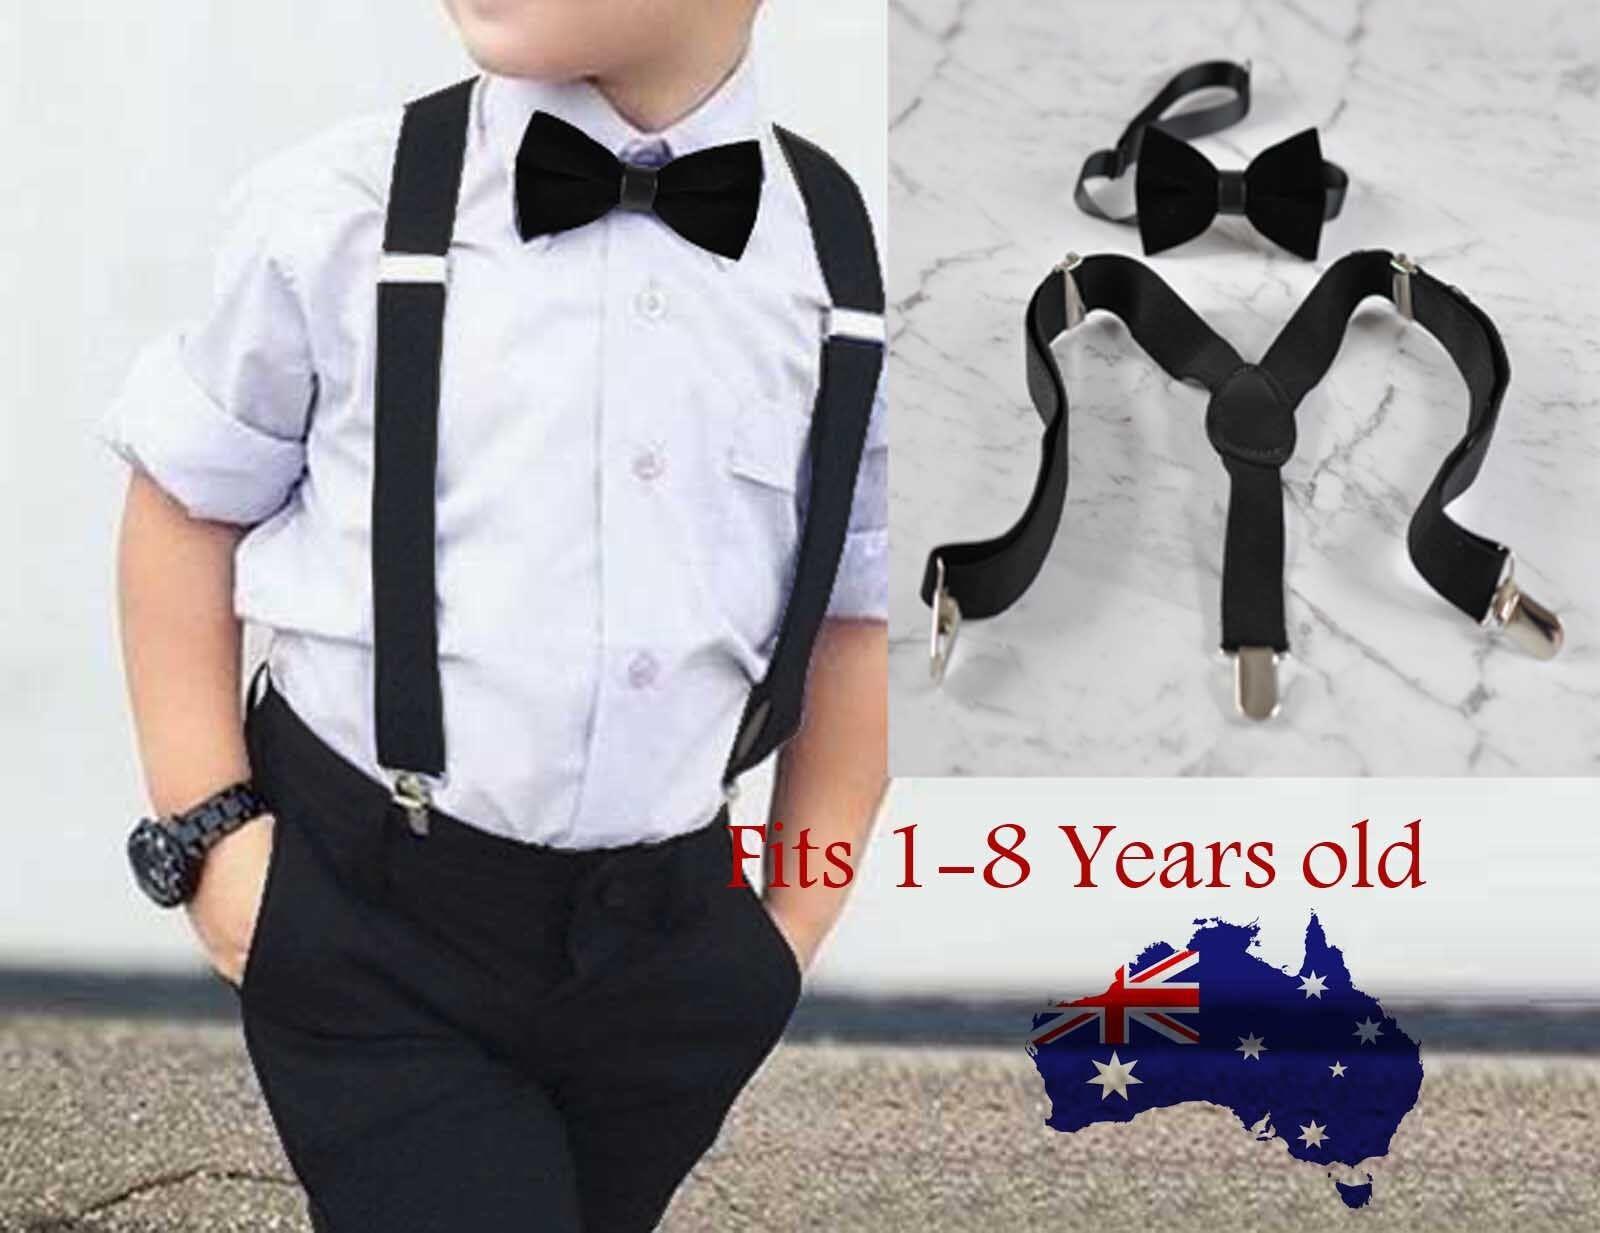 b24418b227e Boy Baby Kids Black Velvet Bow Tie Bowtie Adjustable Suspenders Braces Sets  1-8 Years Old